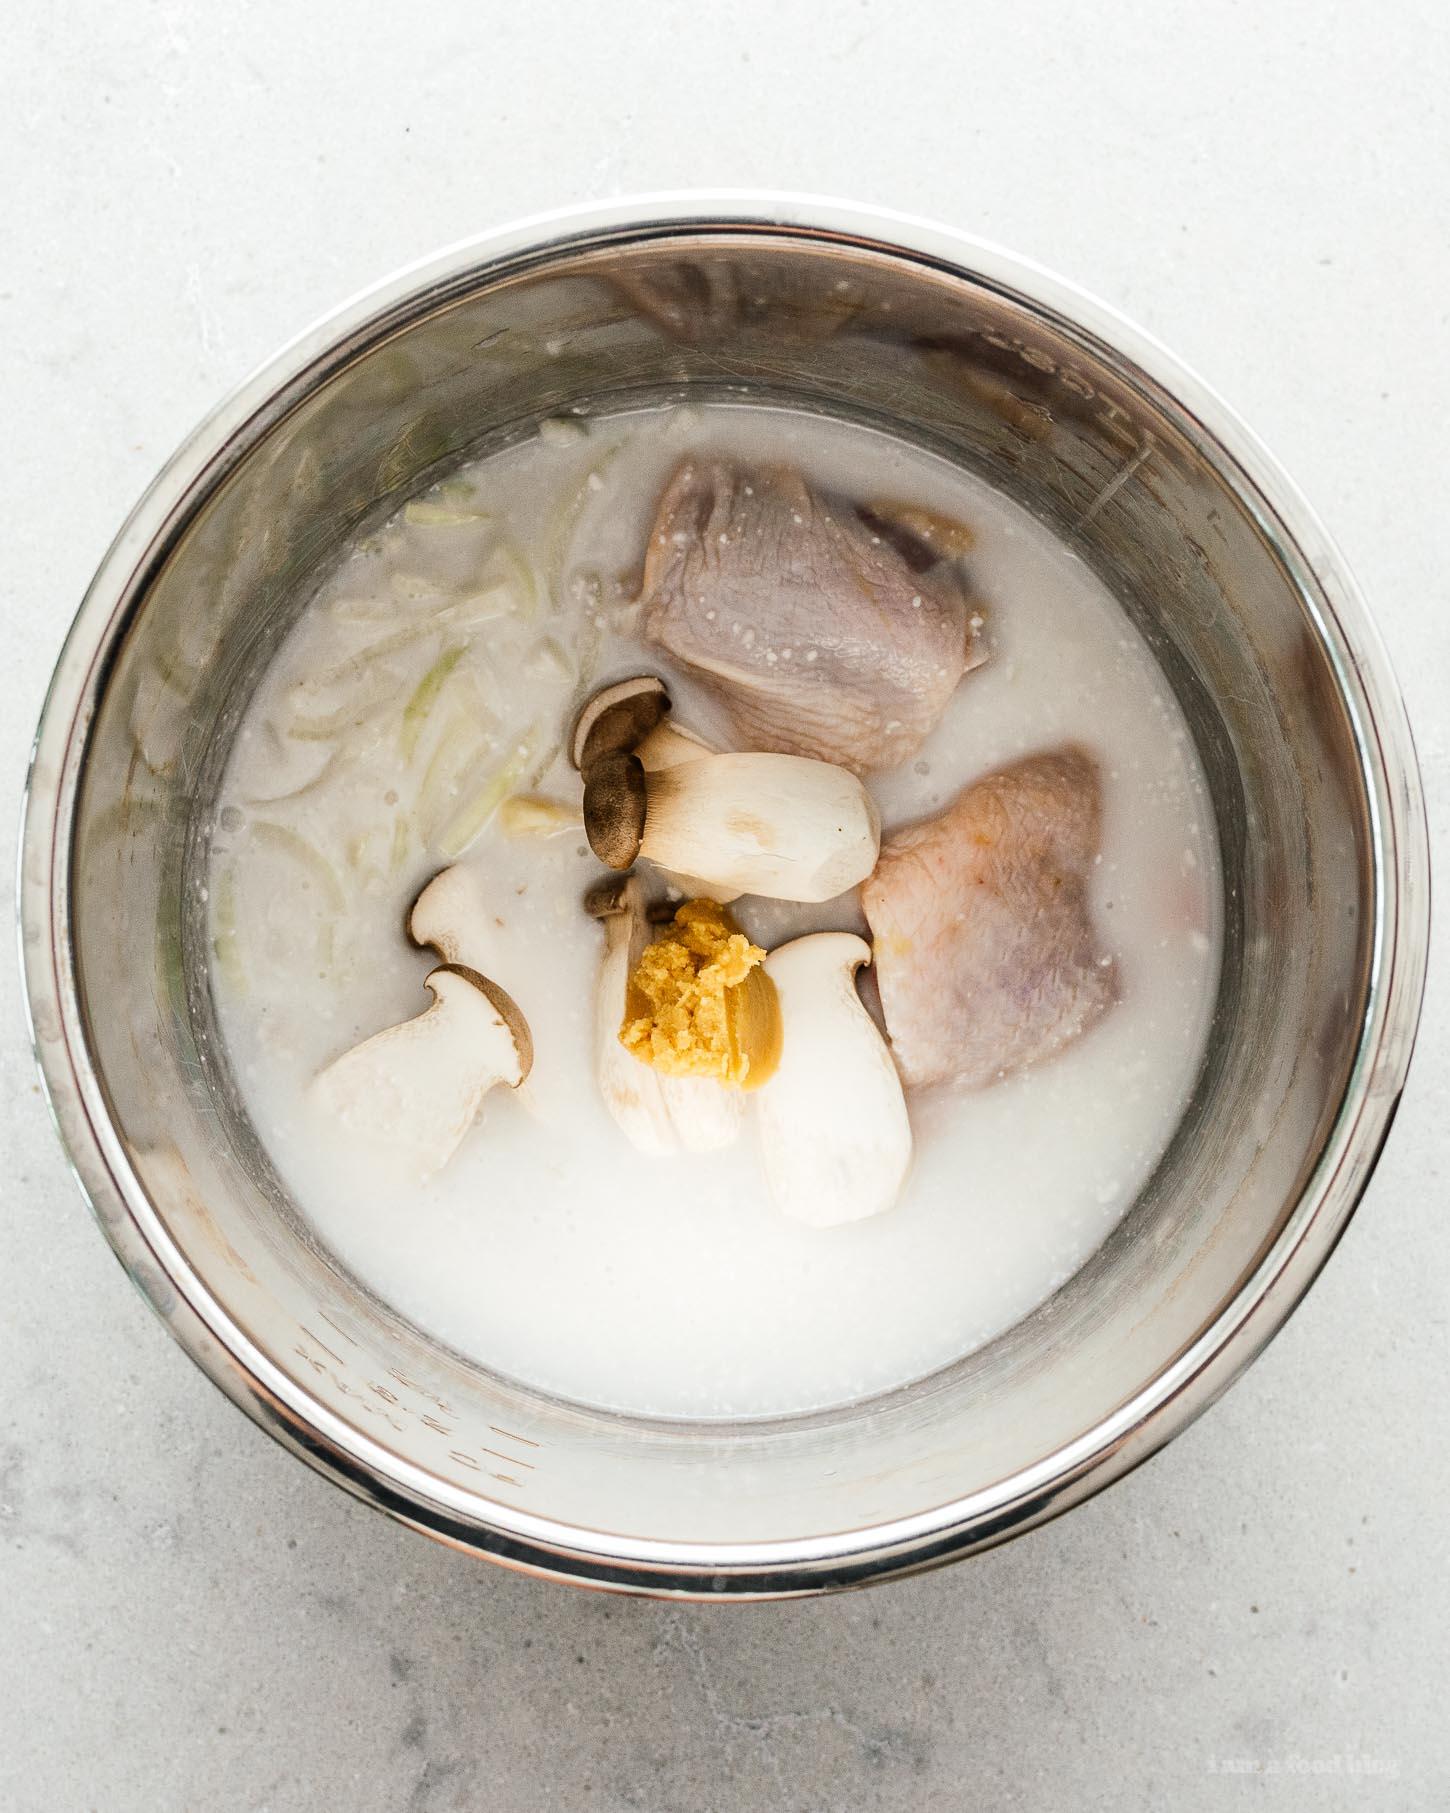 15 Minute Miso Coconut Chicken Ramen Recipe | www.iamafoodblog.com